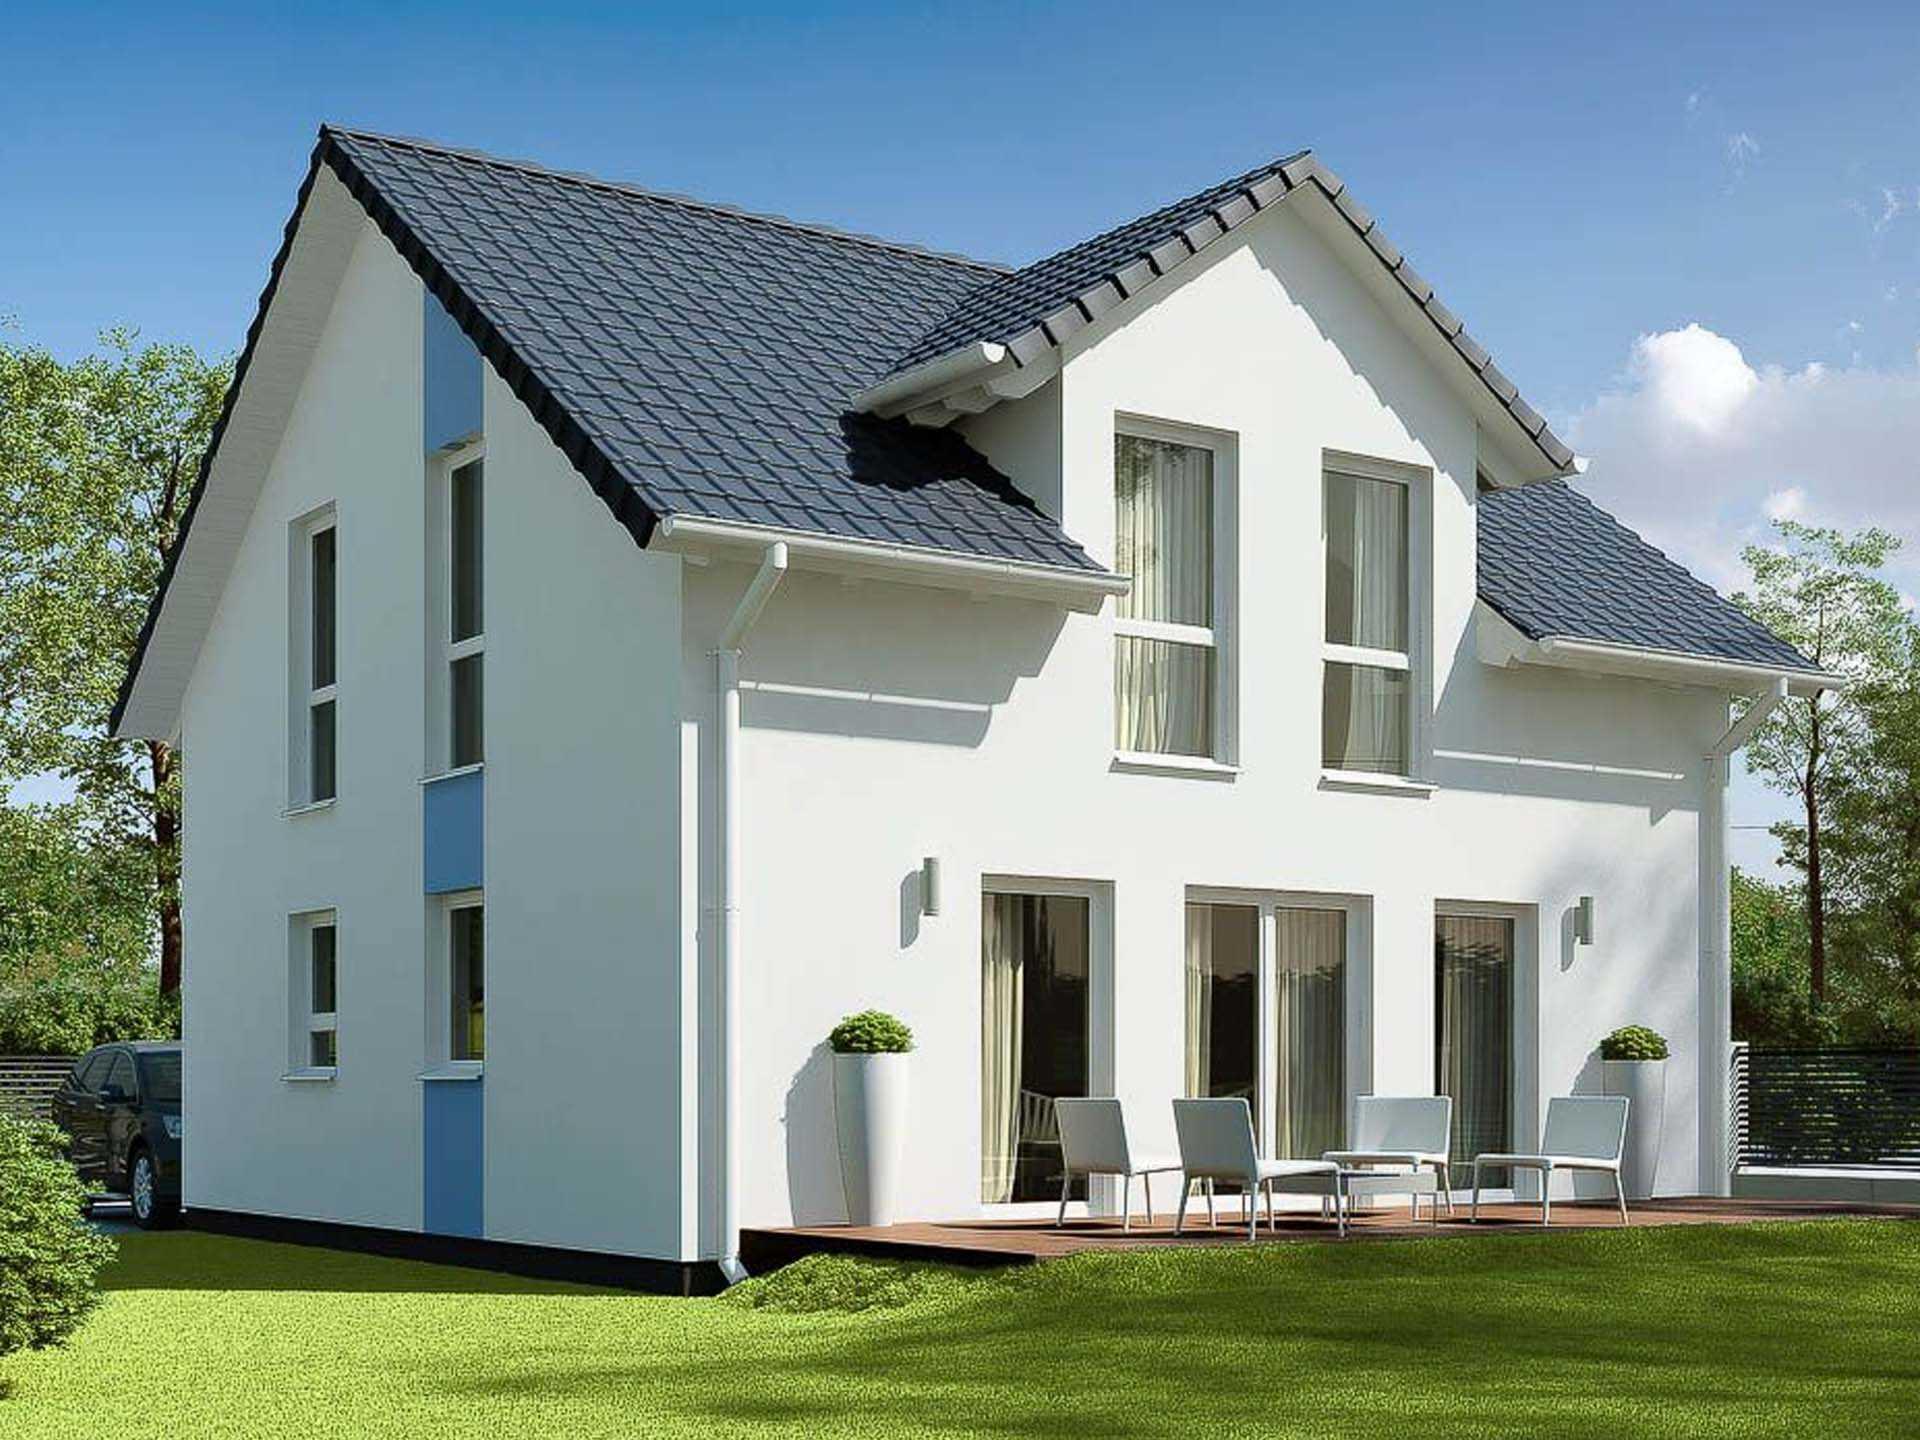 ekodom Hausbau - Einfamilienhaus